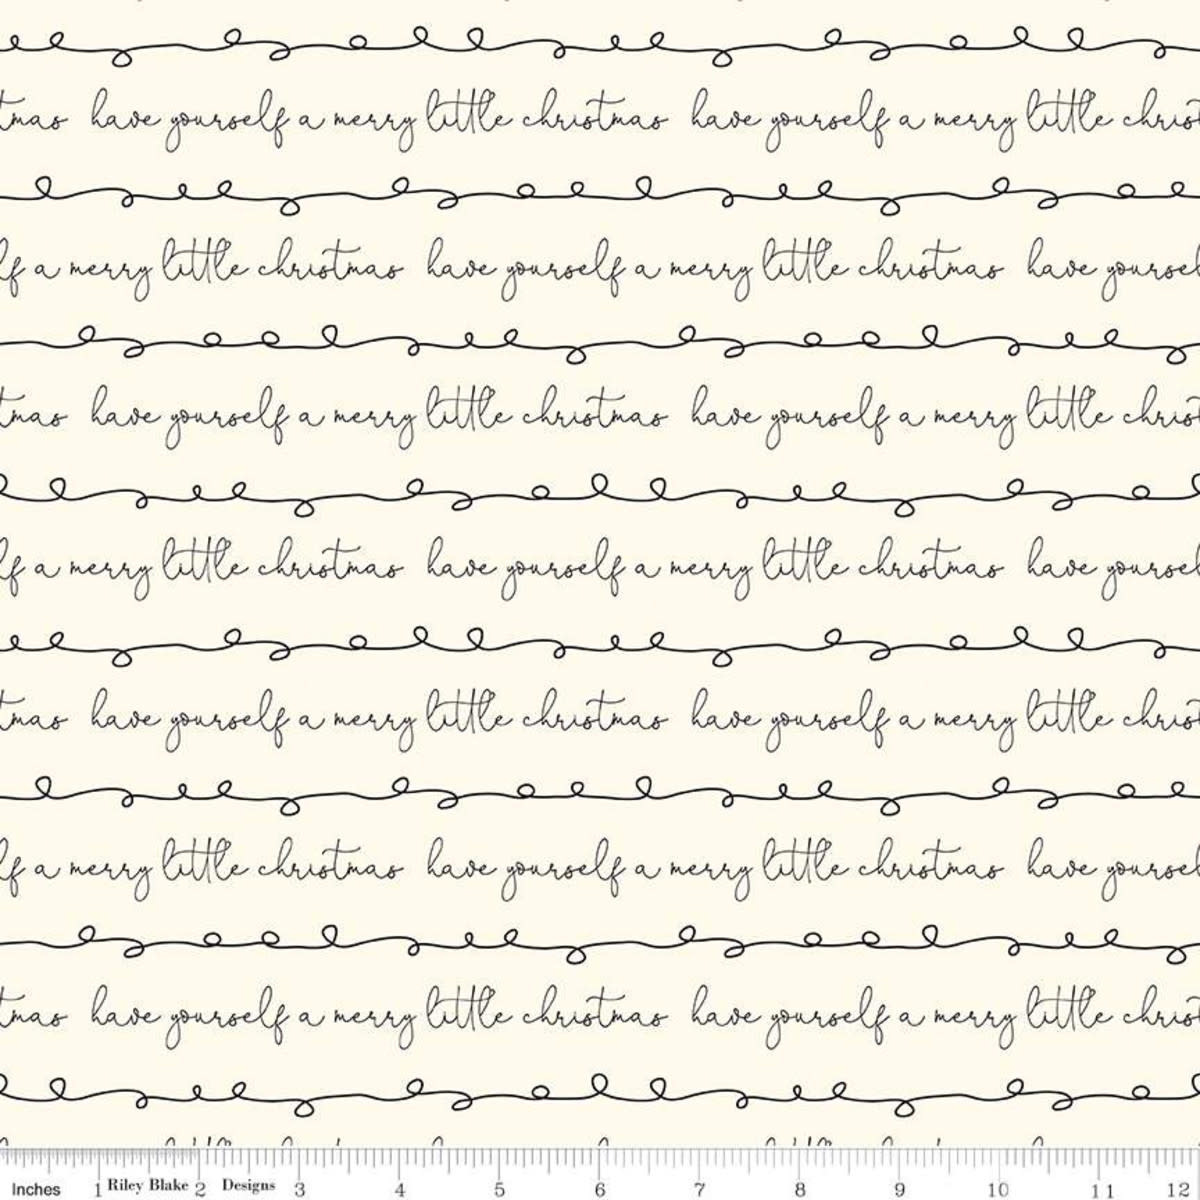 RILEY BLAKE DESIGNS MERRY LITTLE CHRISTMAS, WRITING, CREAM $0.20 /CM OR $20/M